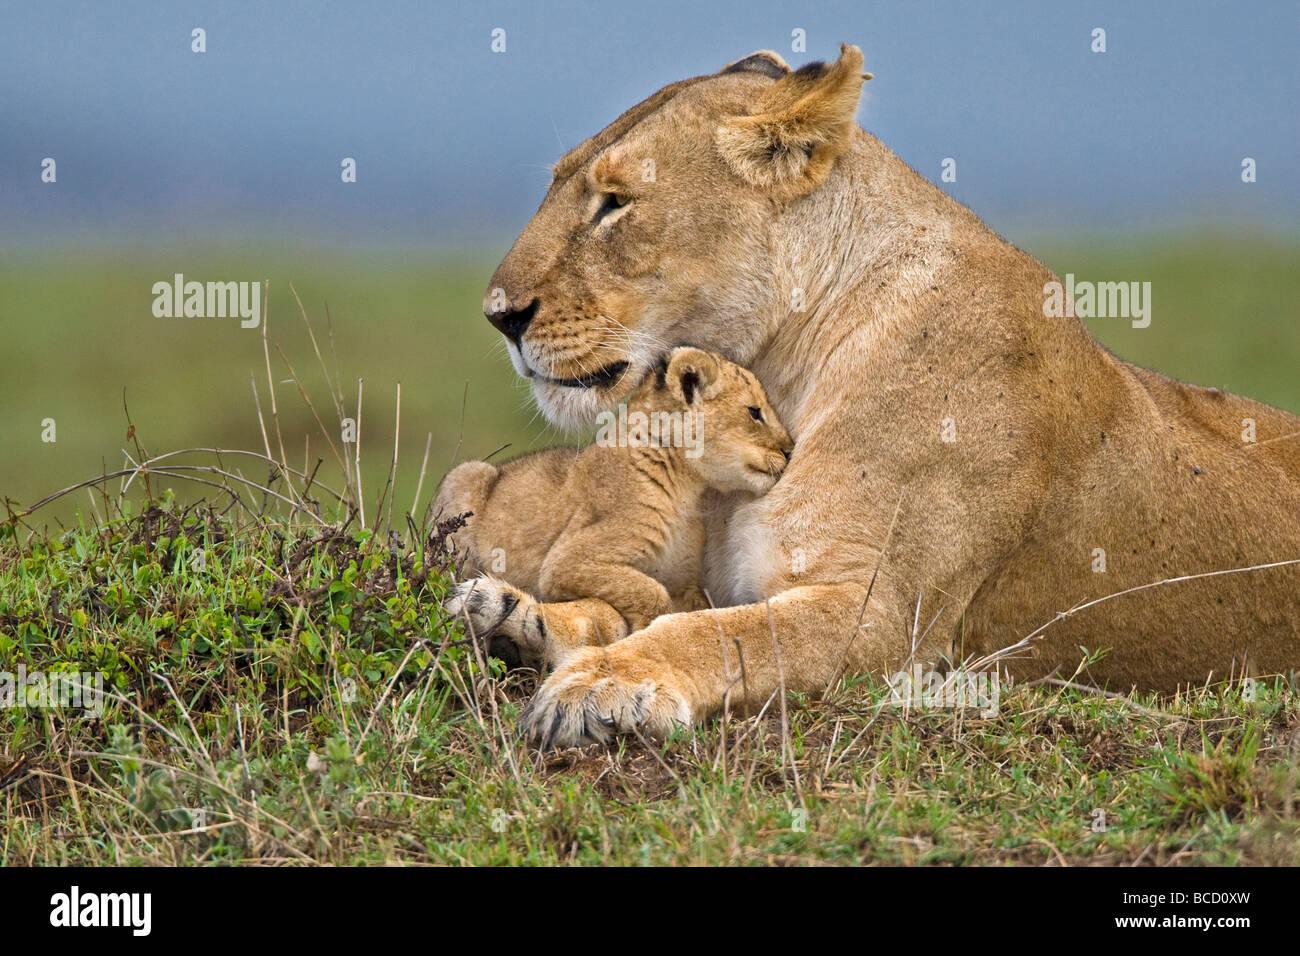 African Lion (Panthera leo) mother and very young cub. Masai Mara. Kenya. Africa Stock Photo